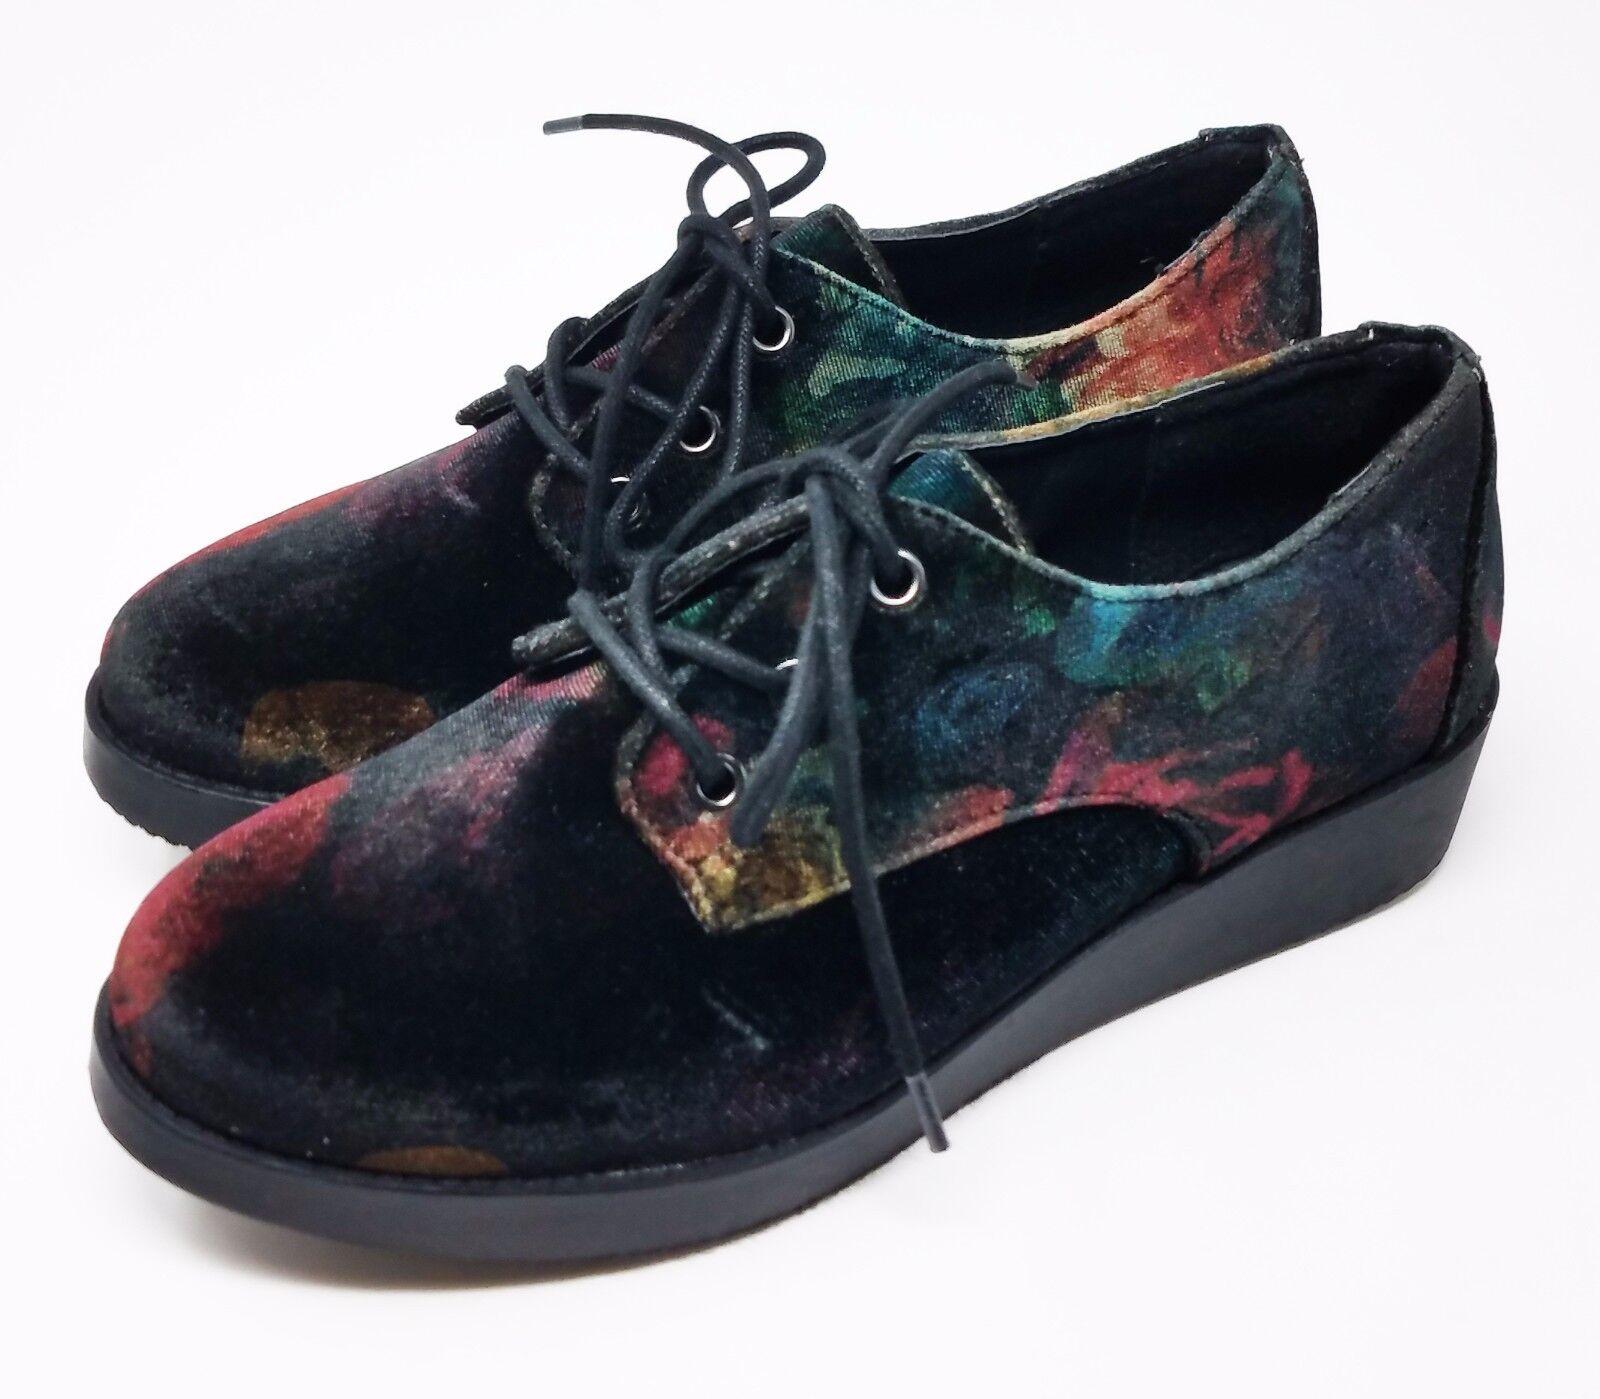 Madden Girl Girl Madden Suede Platform Shoes, Multicolor Size: 7M 38e1c6